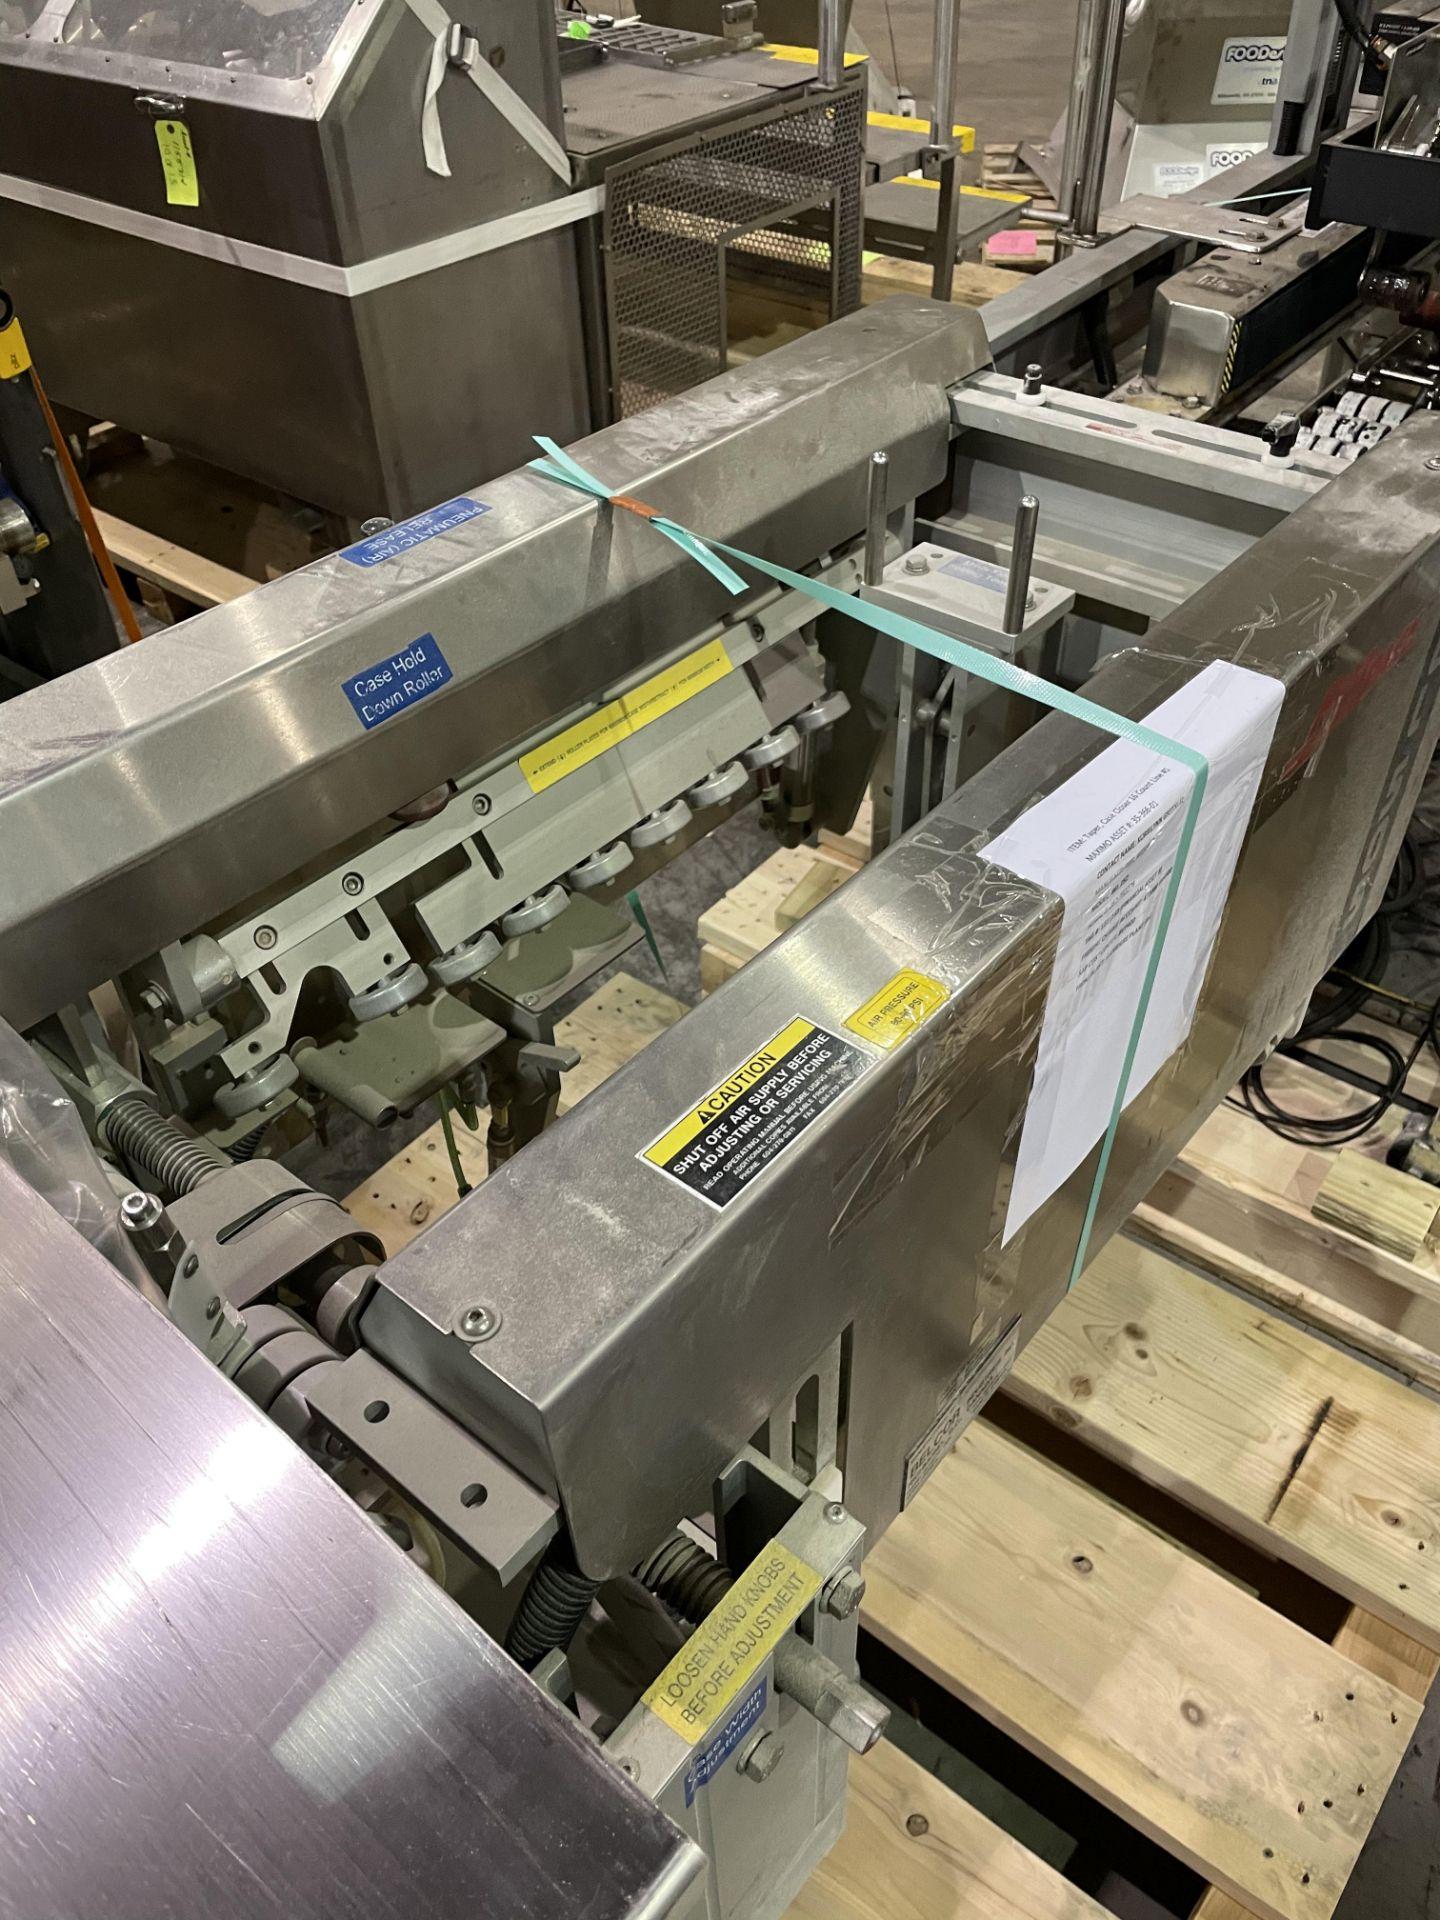 Belcor 252 Taper and Bel 505 Snap Folder and Marsh Patrion Printer NO TAPE HEADS Loading/Rigging Fe - Image 3 of 4